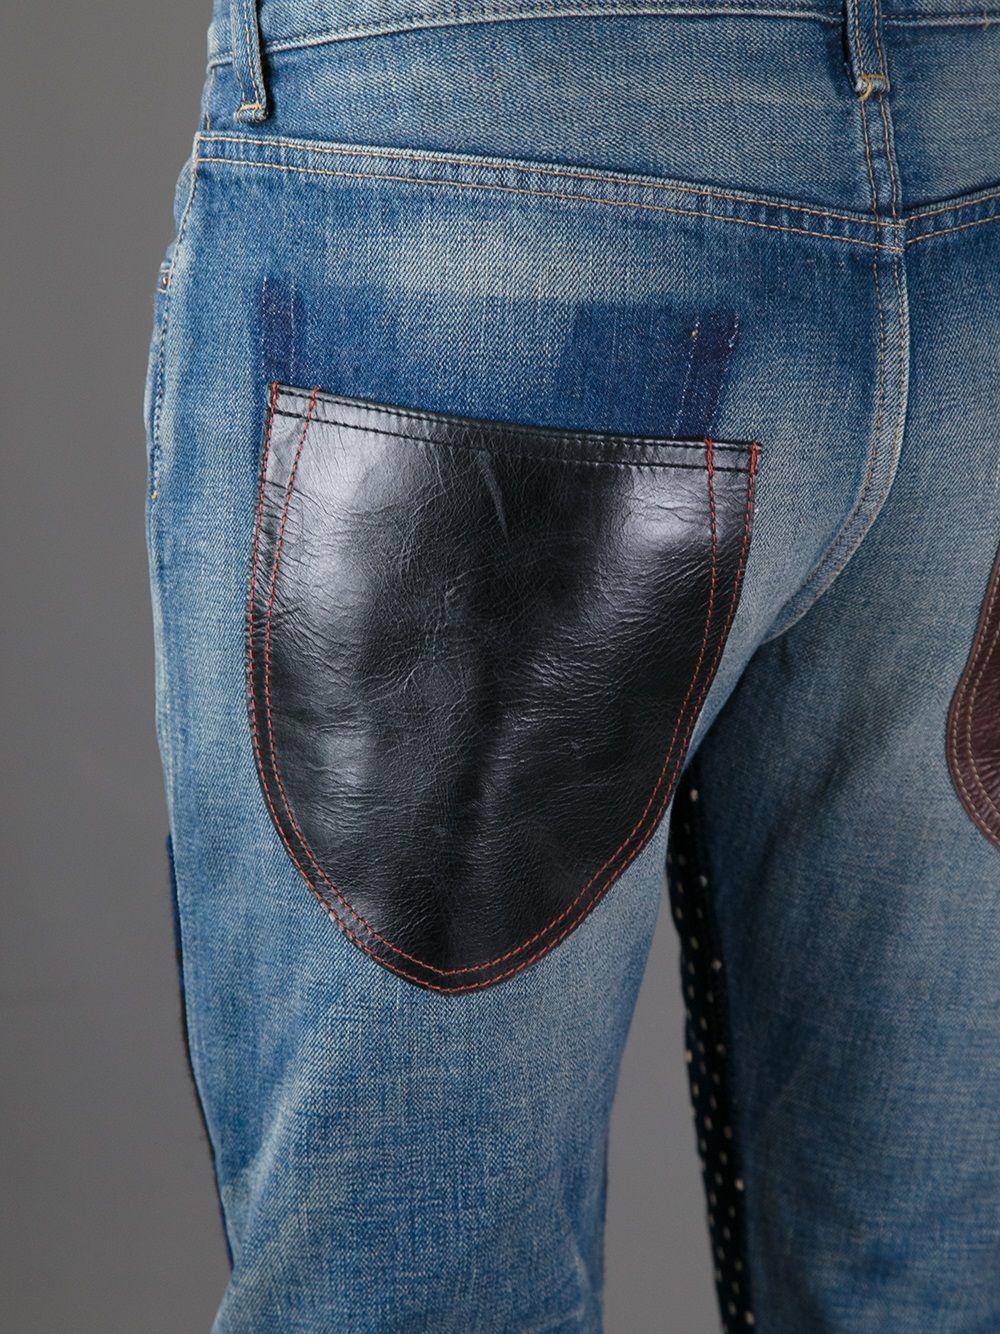 post-5648-1377428184.jpg (1000×1334) | Pantalones